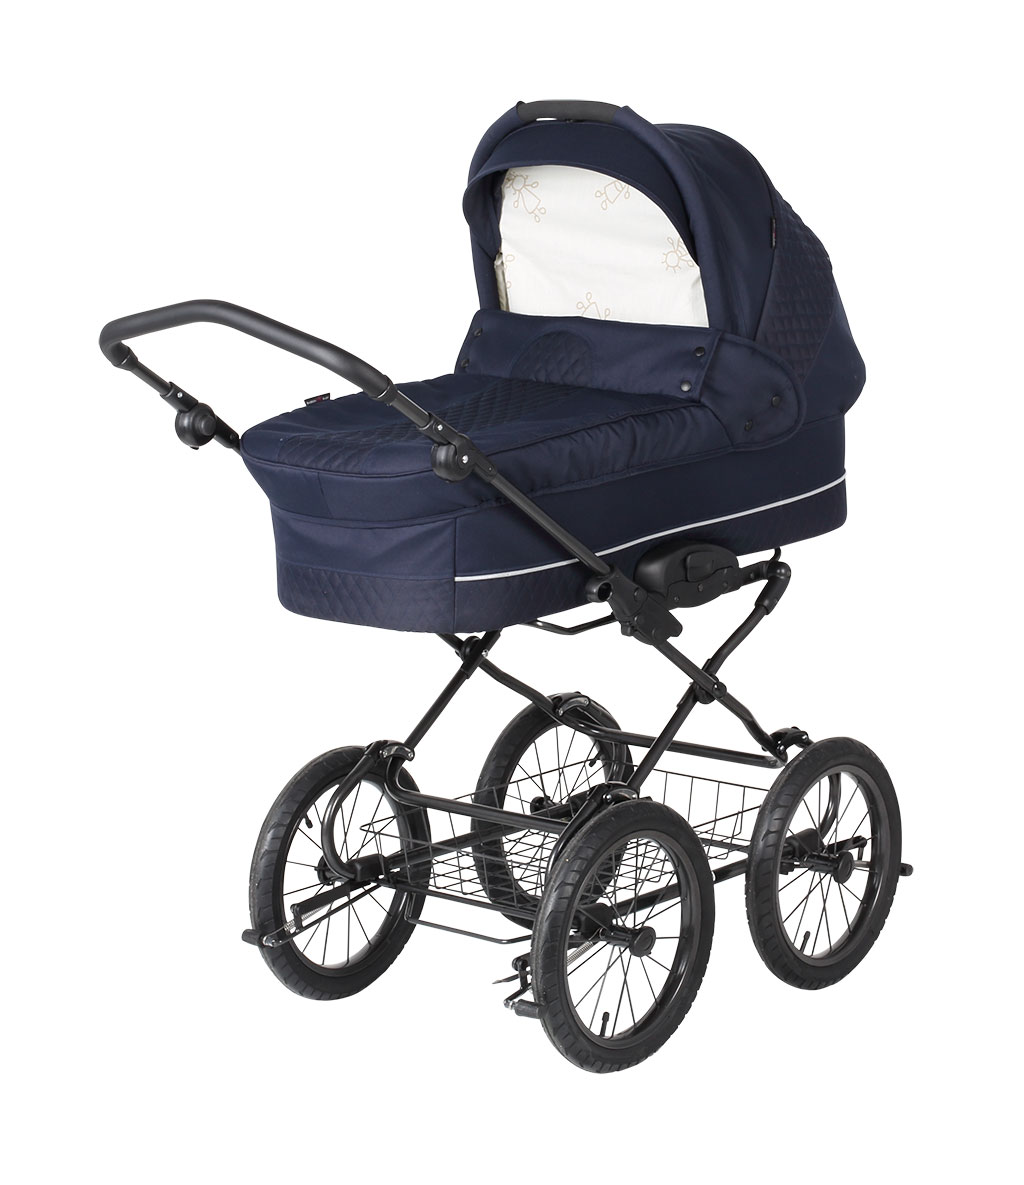 basson baby grande soft kinderwagen marineblau gesteppt grande soft basson baby. Black Bedroom Furniture Sets. Home Design Ideas